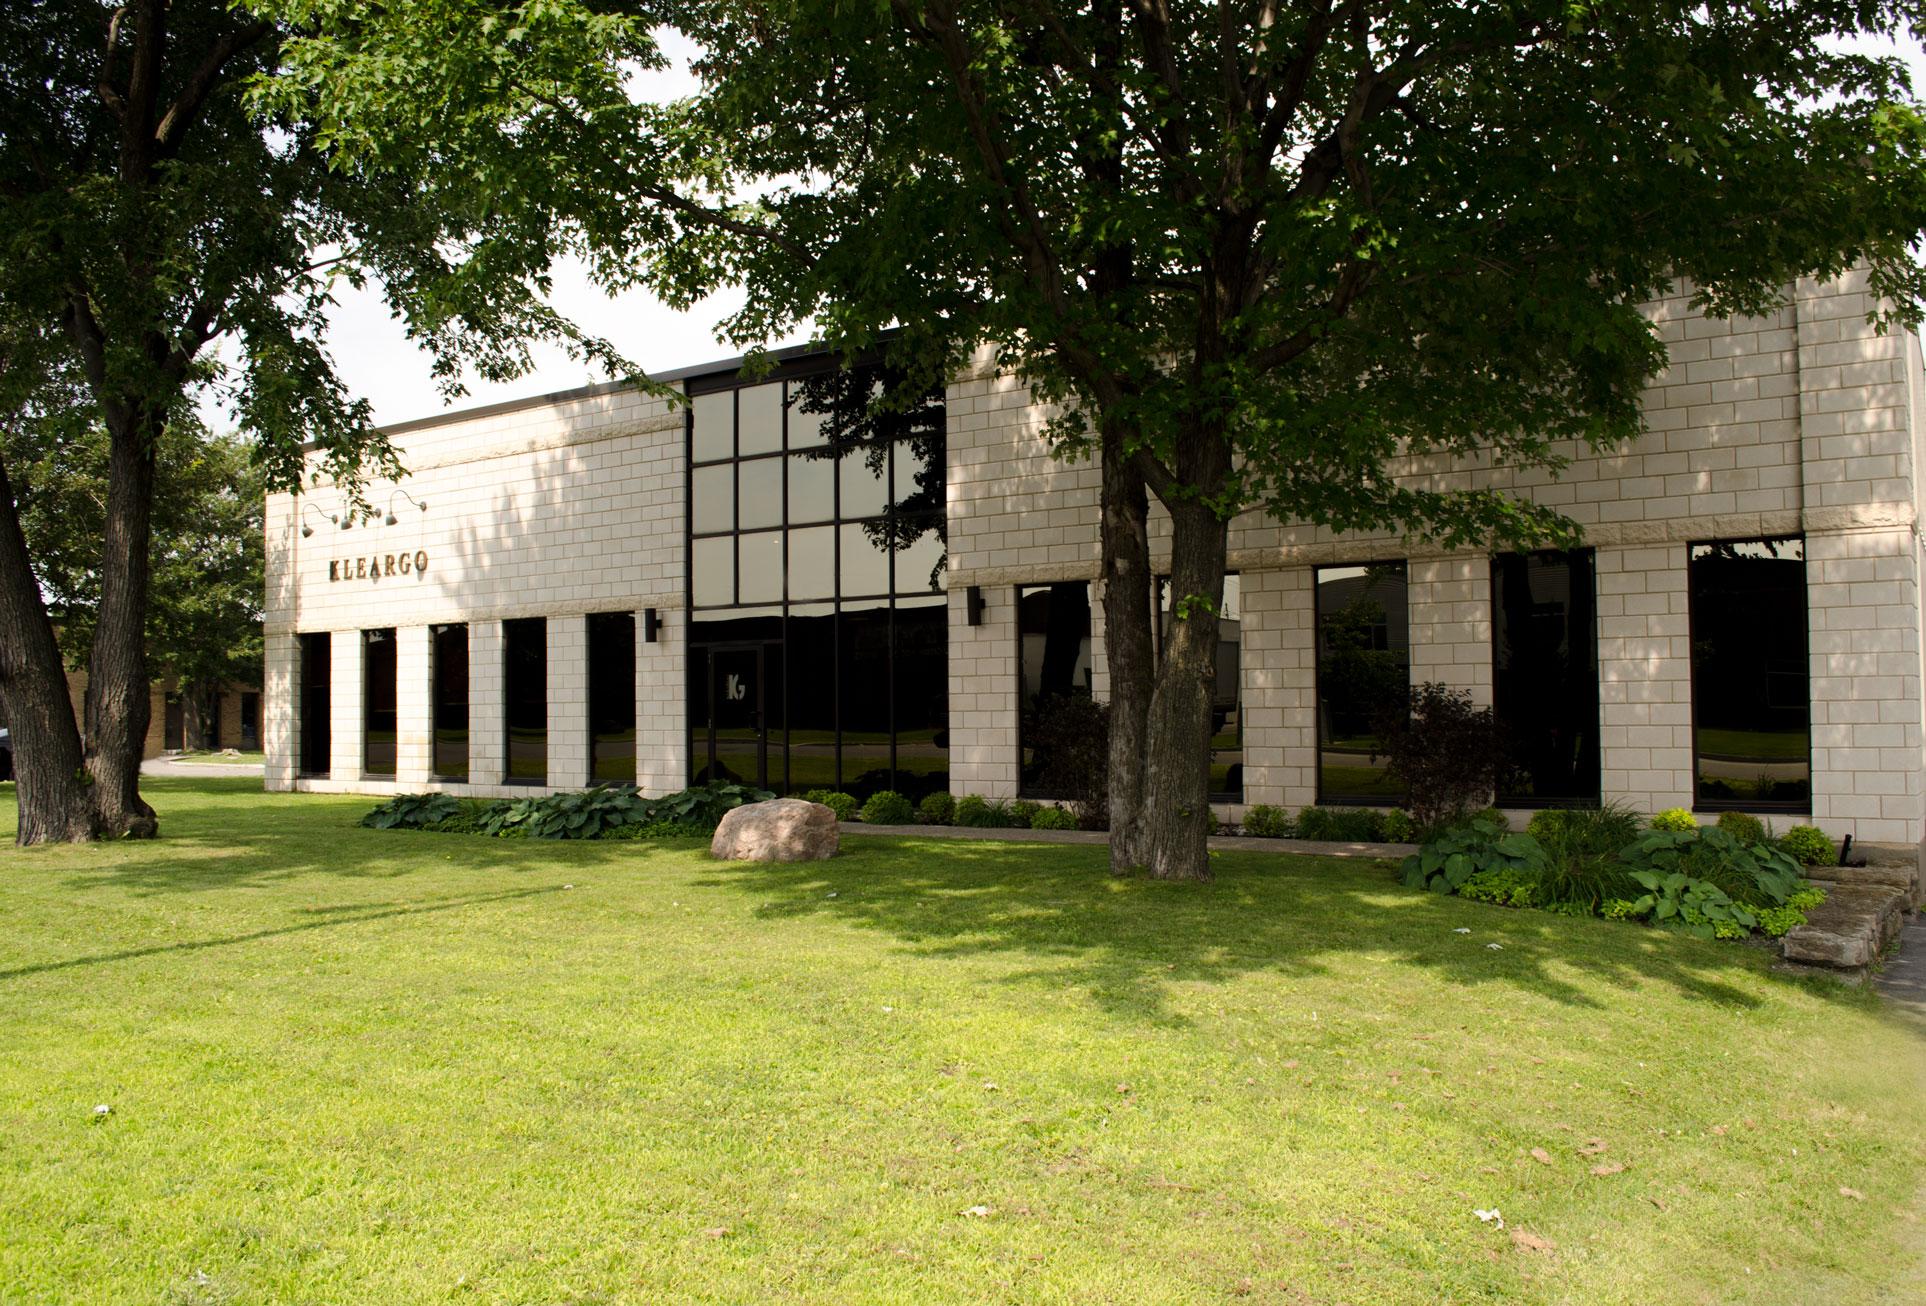 Kleargo Offices